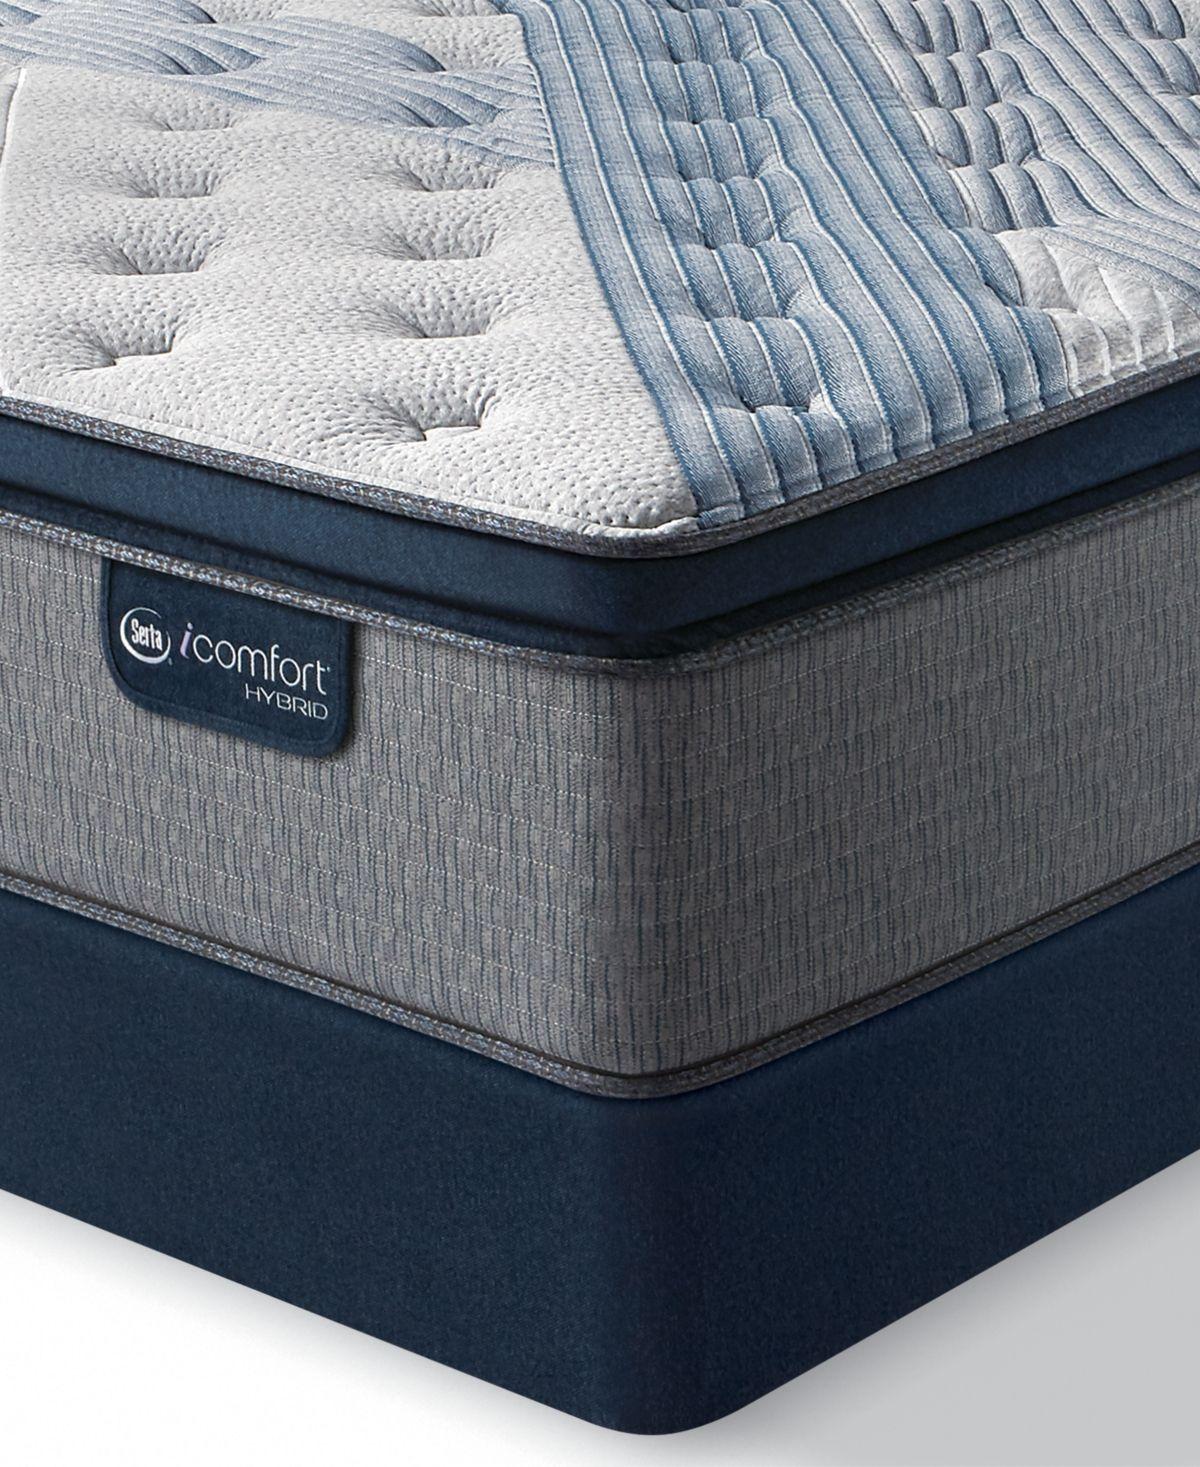 Icomfort By Serta Blue Fusion 1000 14 5 Hybrid Plush Euro Pillow Top Mattress Set California King Mattress Sets Pillow Top Mattress Memory Foam